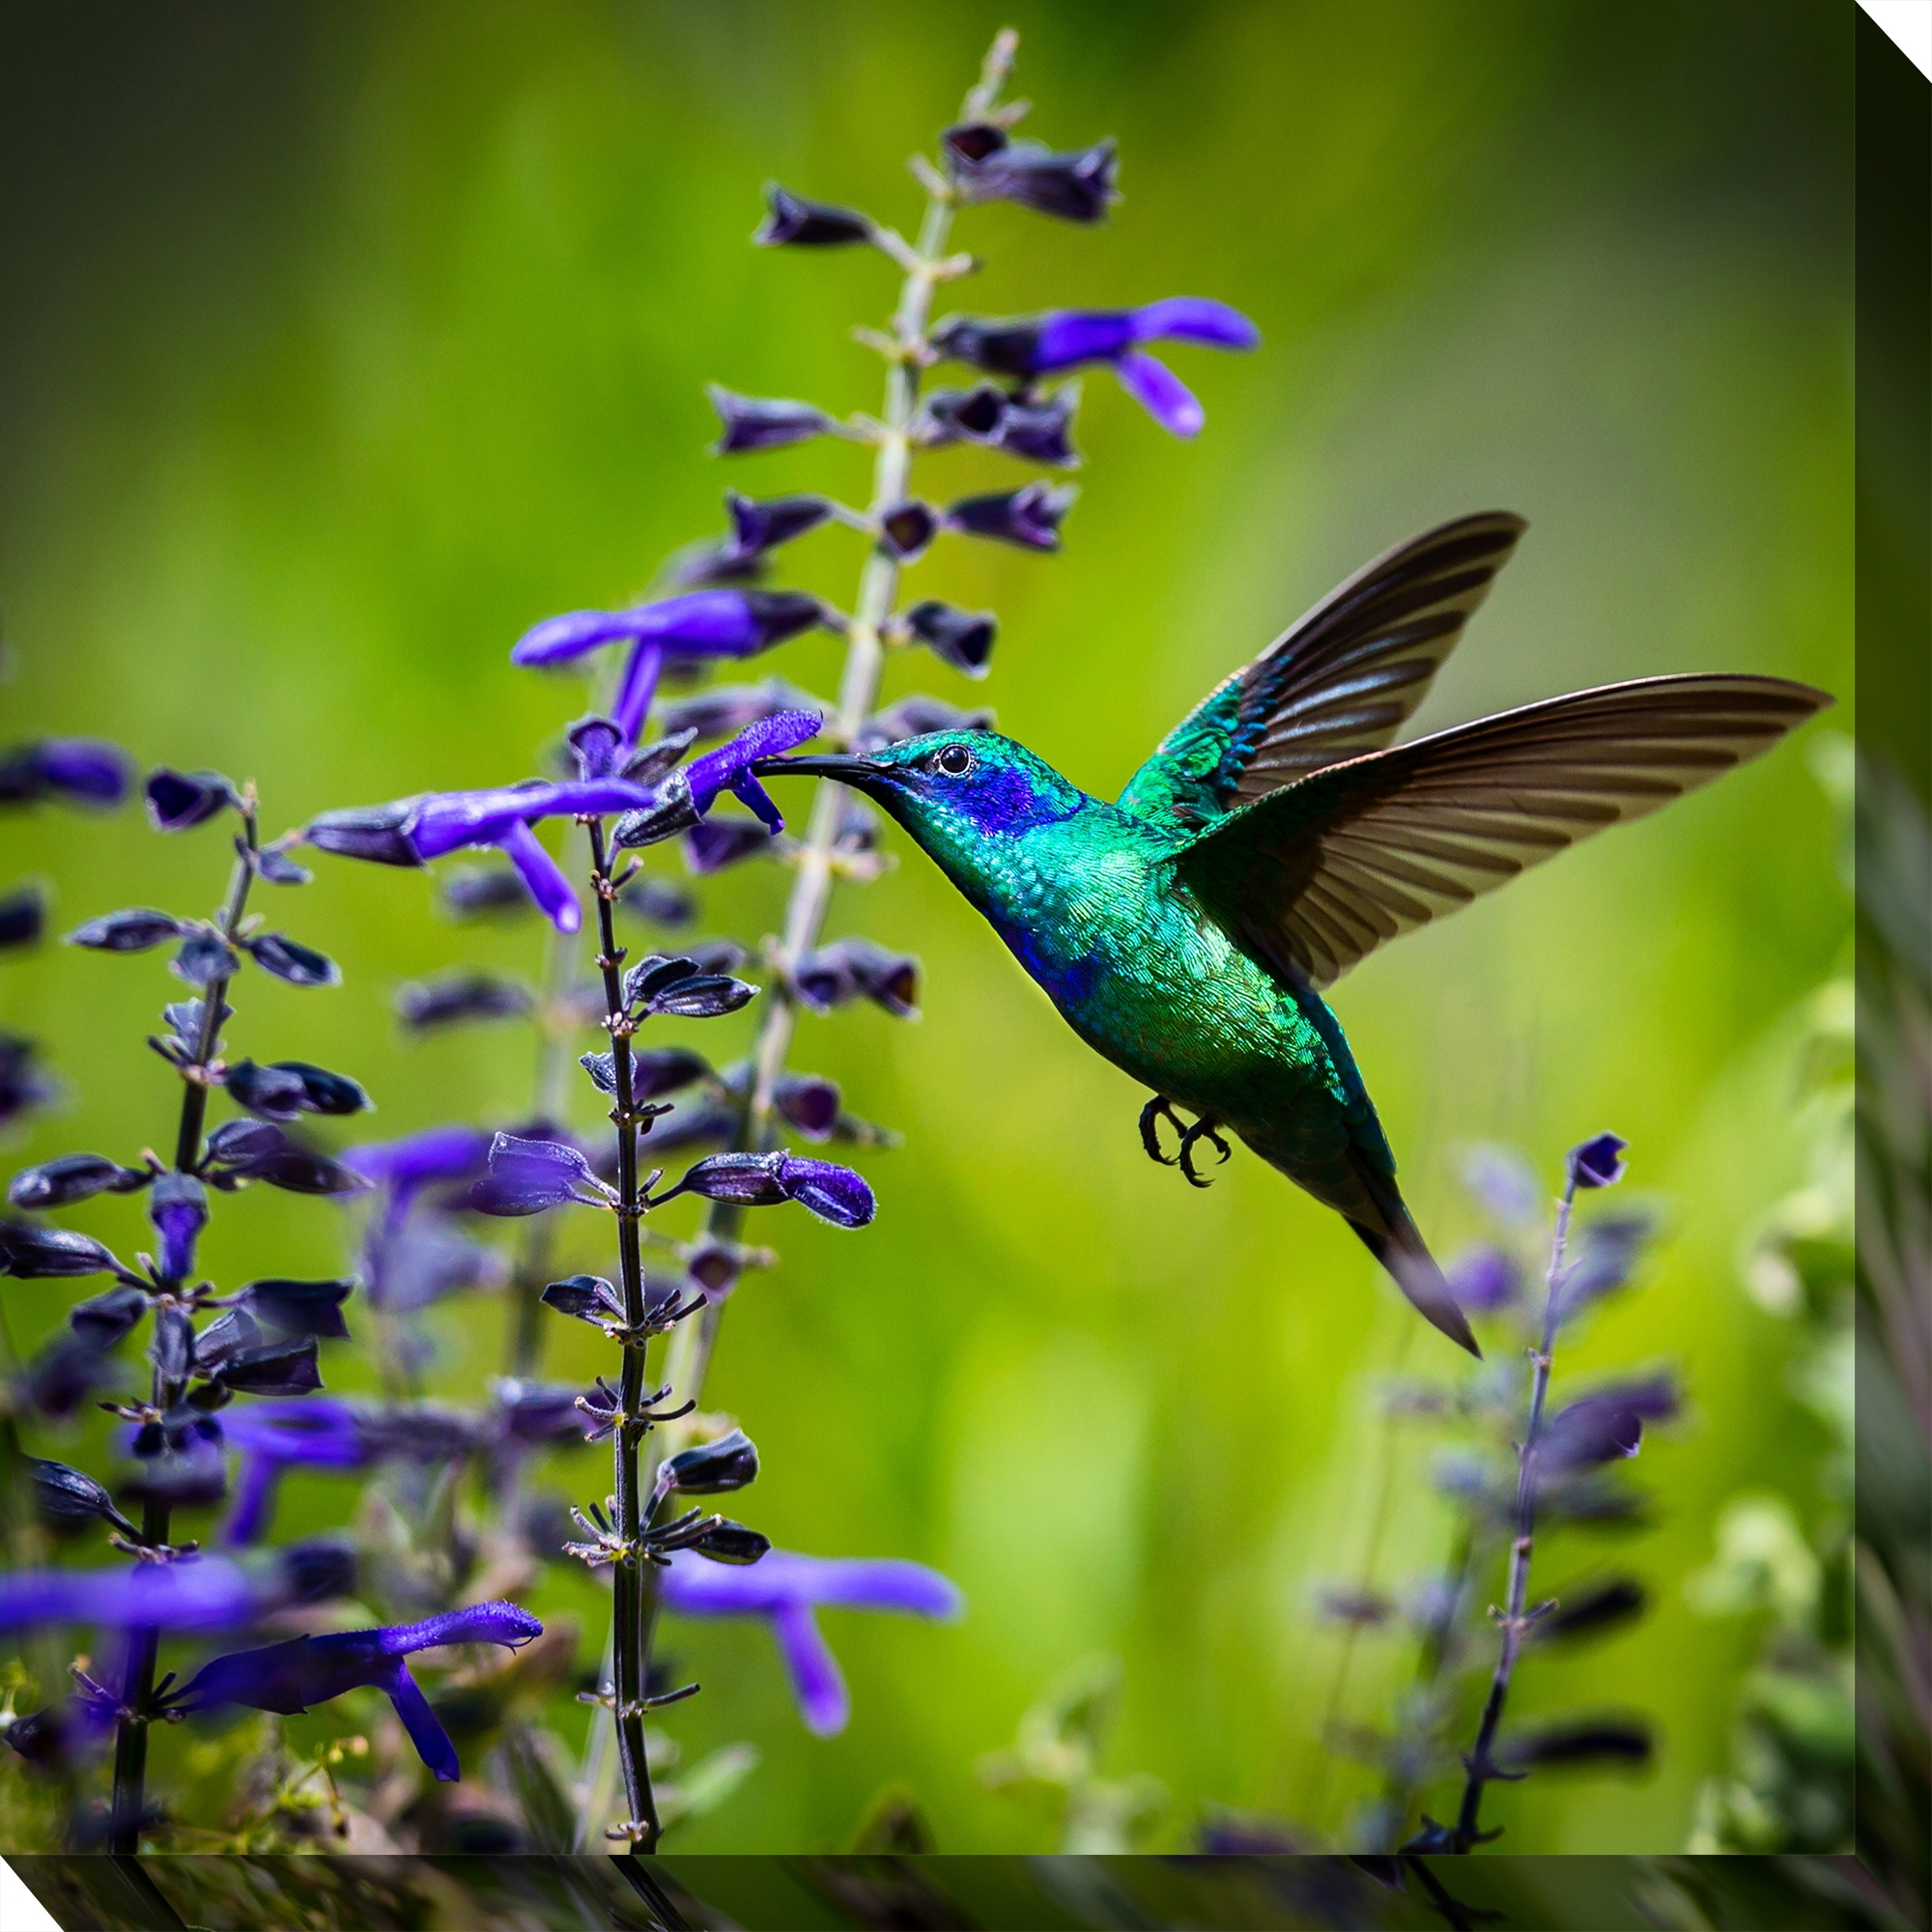 Canvas Wall Art Hummingbird